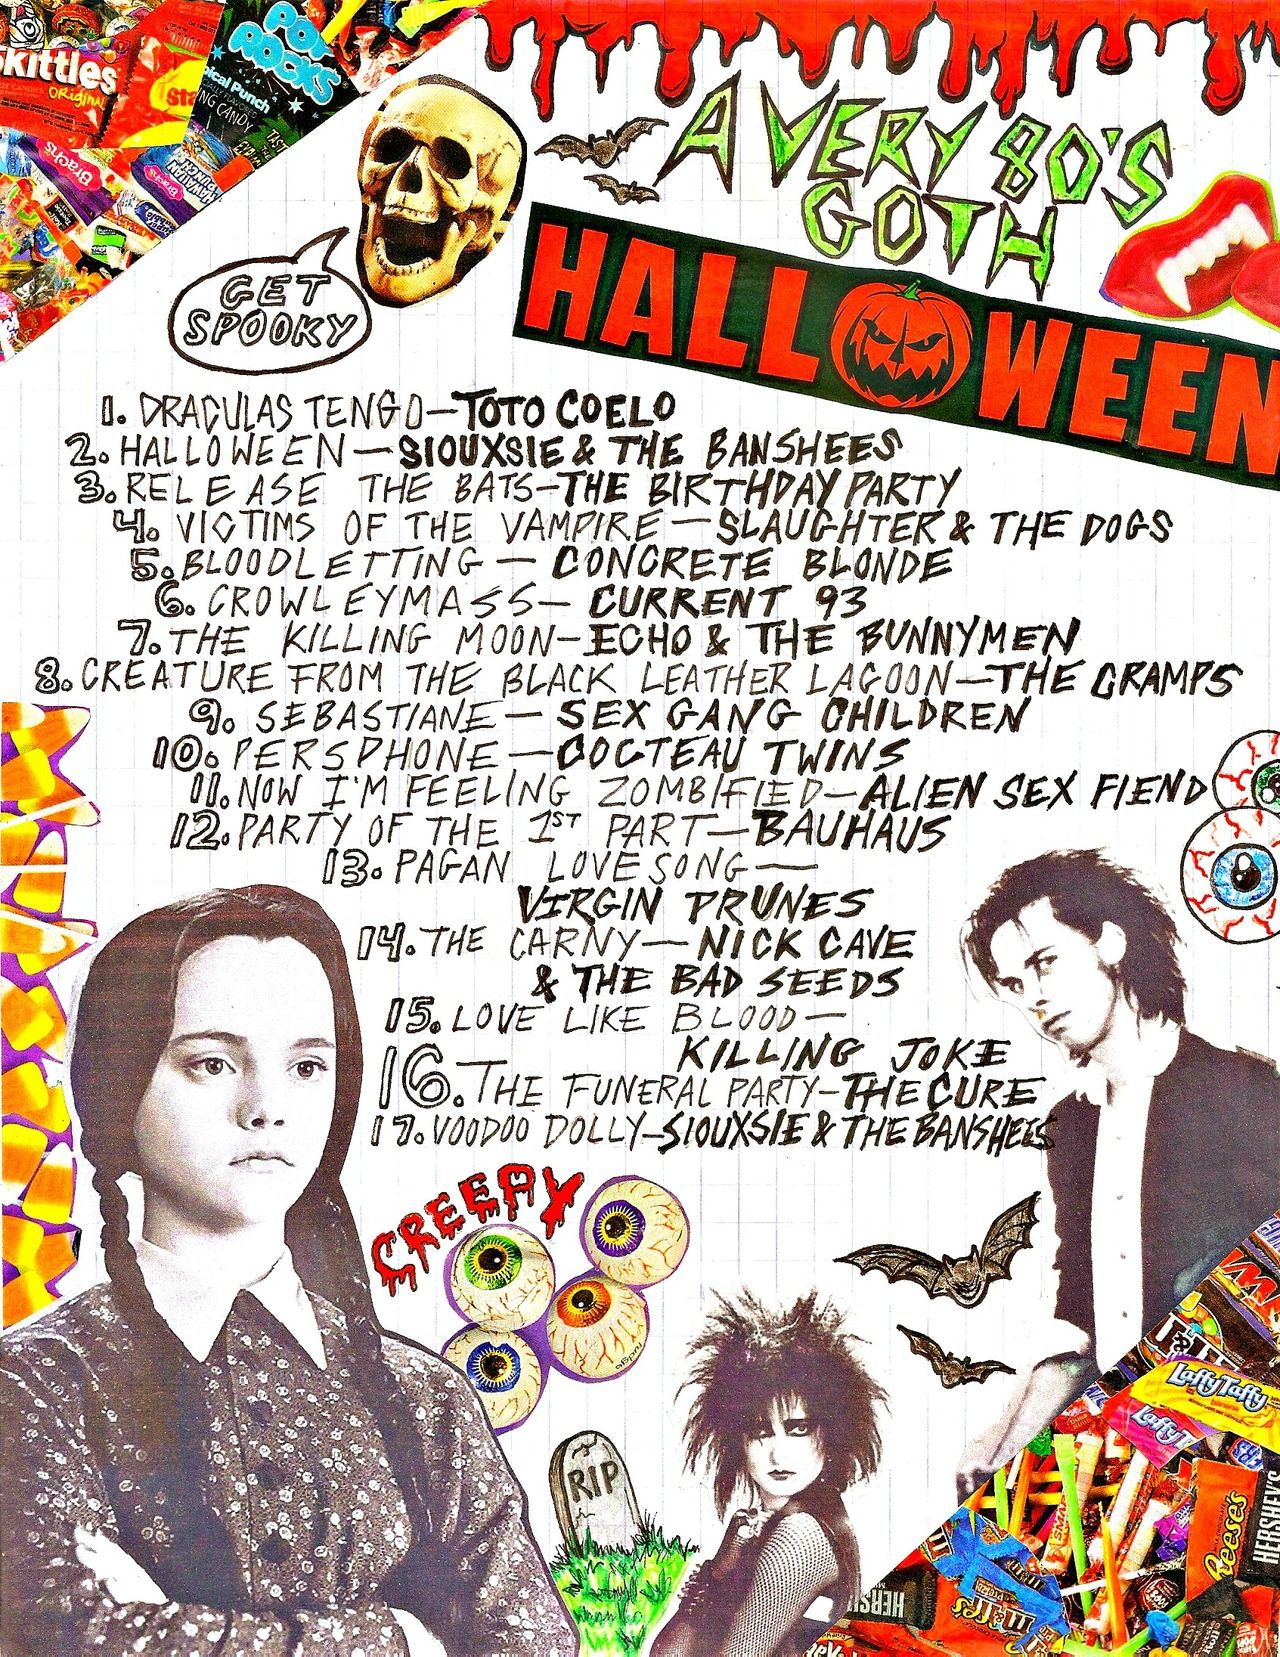 80s goth halloween mixtape !! listen to it on 8tracks here ...